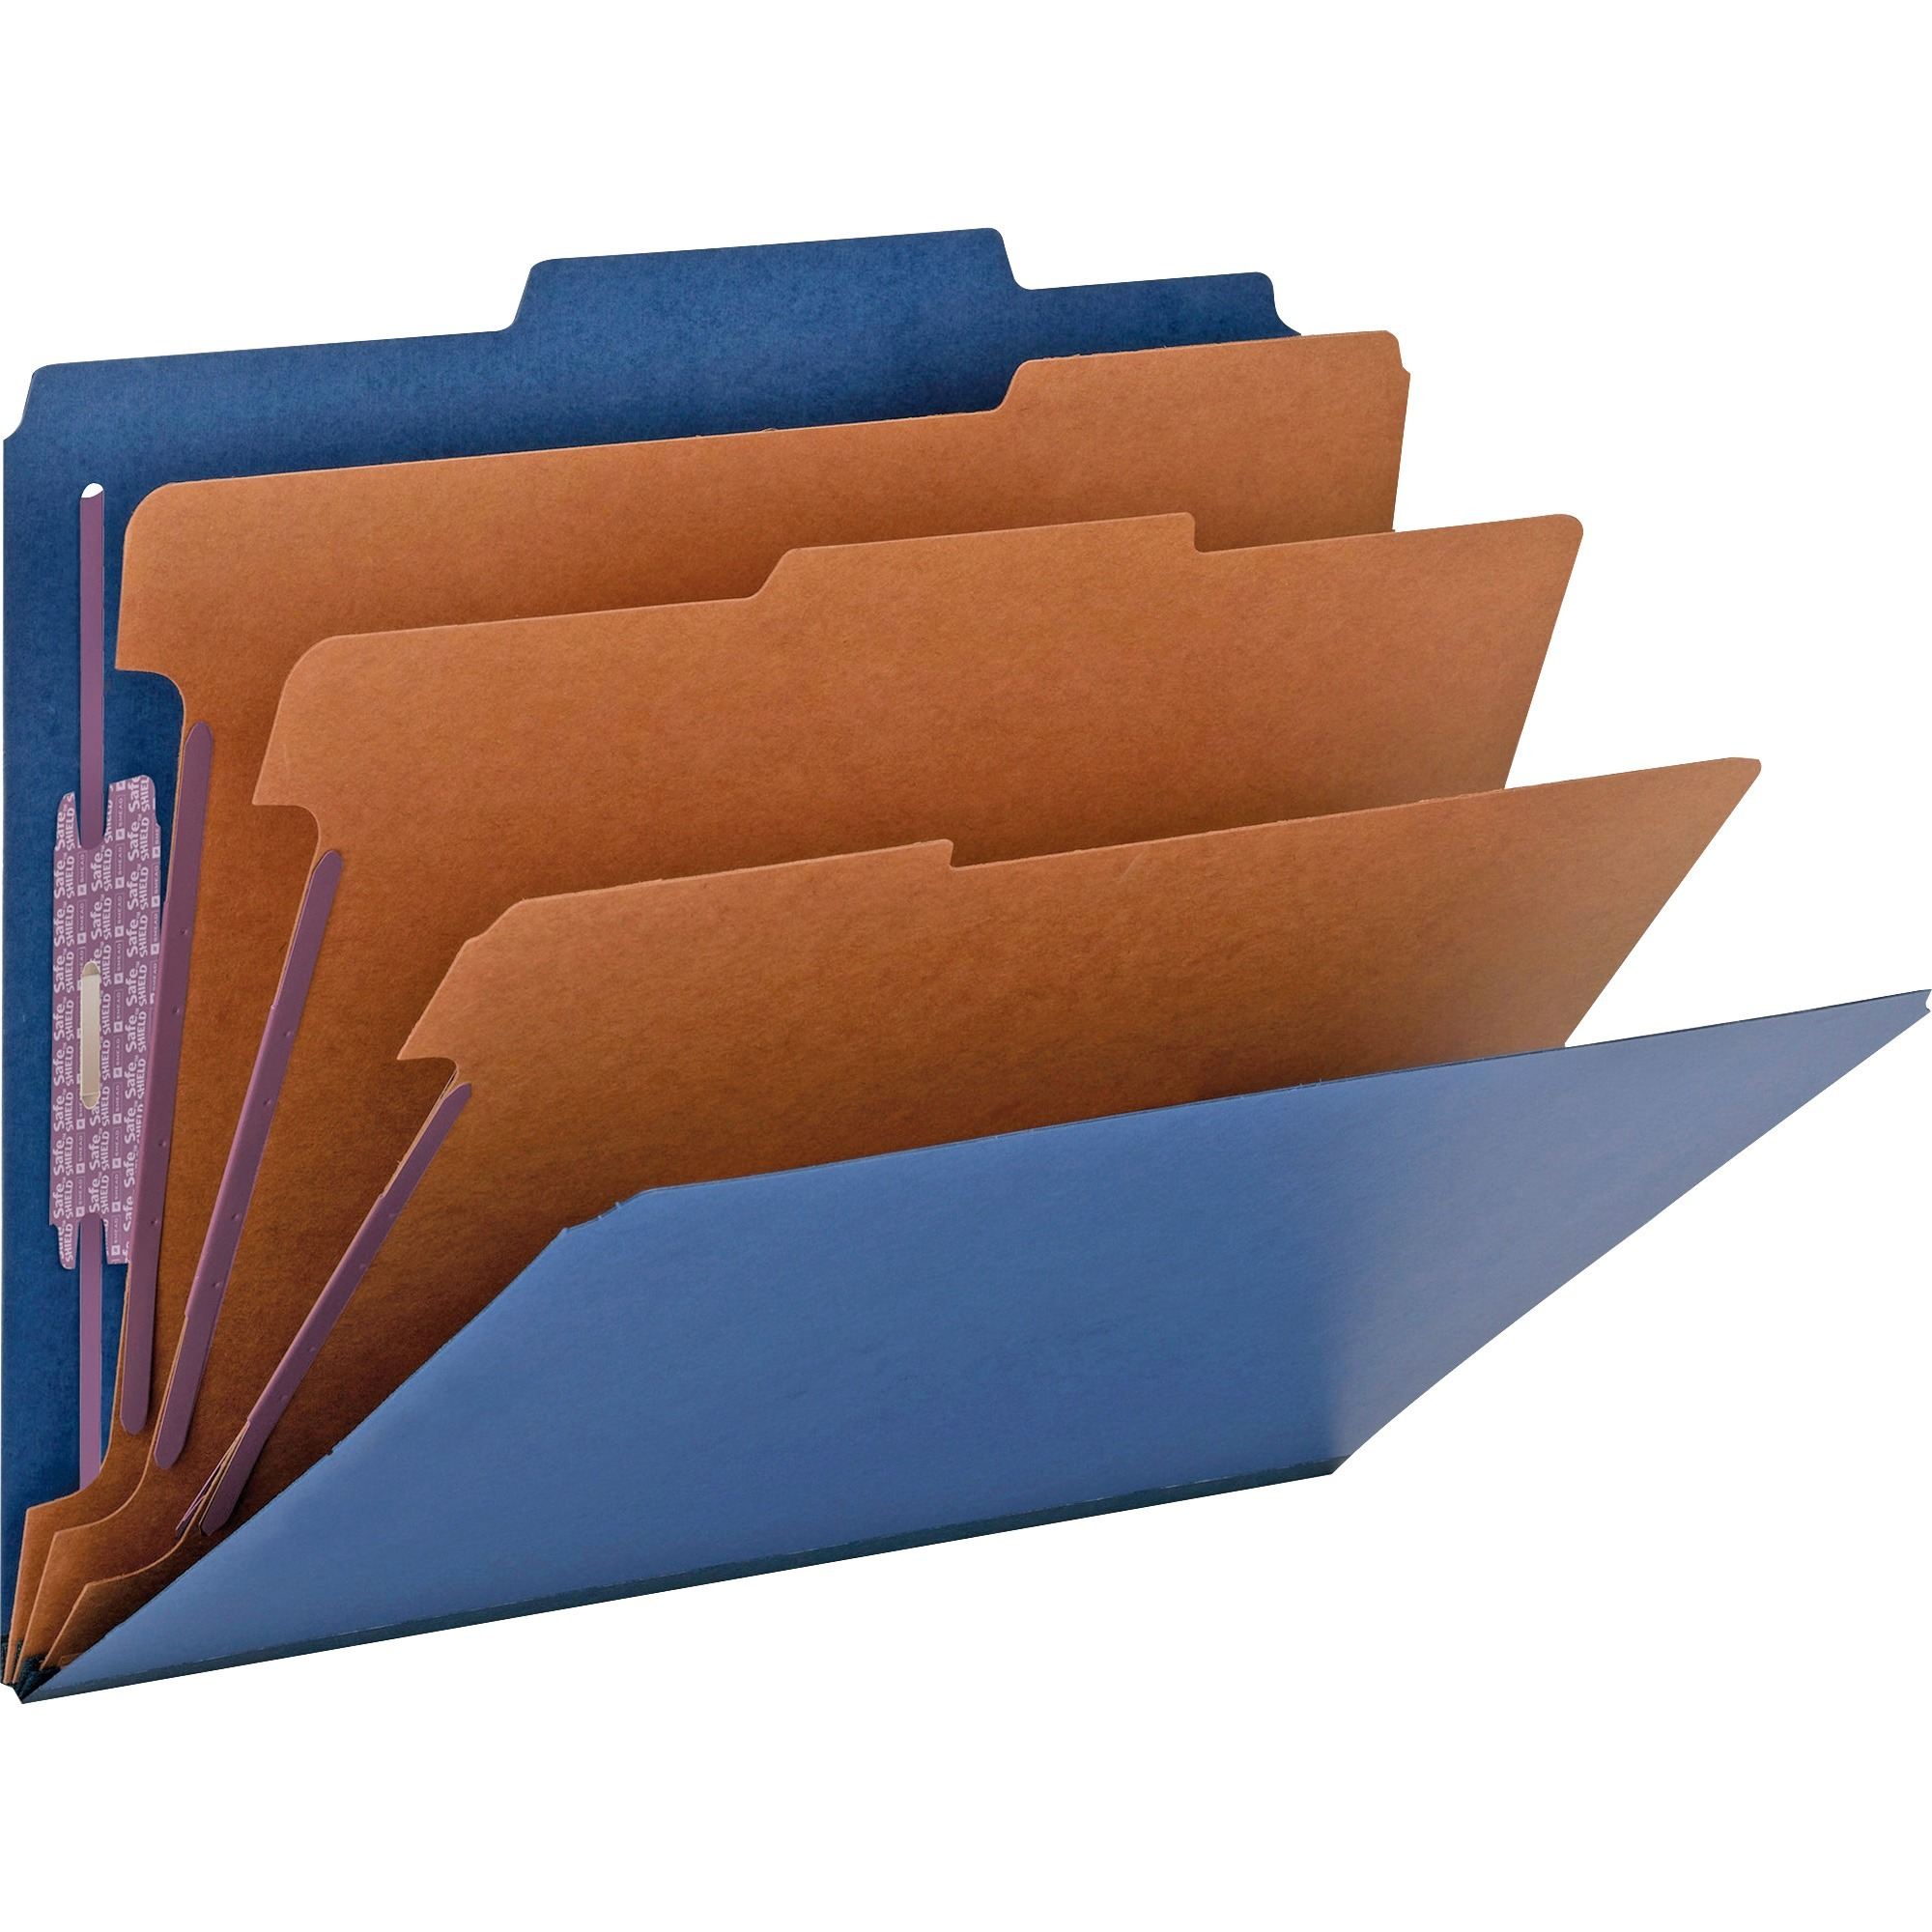 Smead, SMD14096, SafeSHIELD Fasteners 3-Div Classification Folders, 10 / Box, Dark Blue